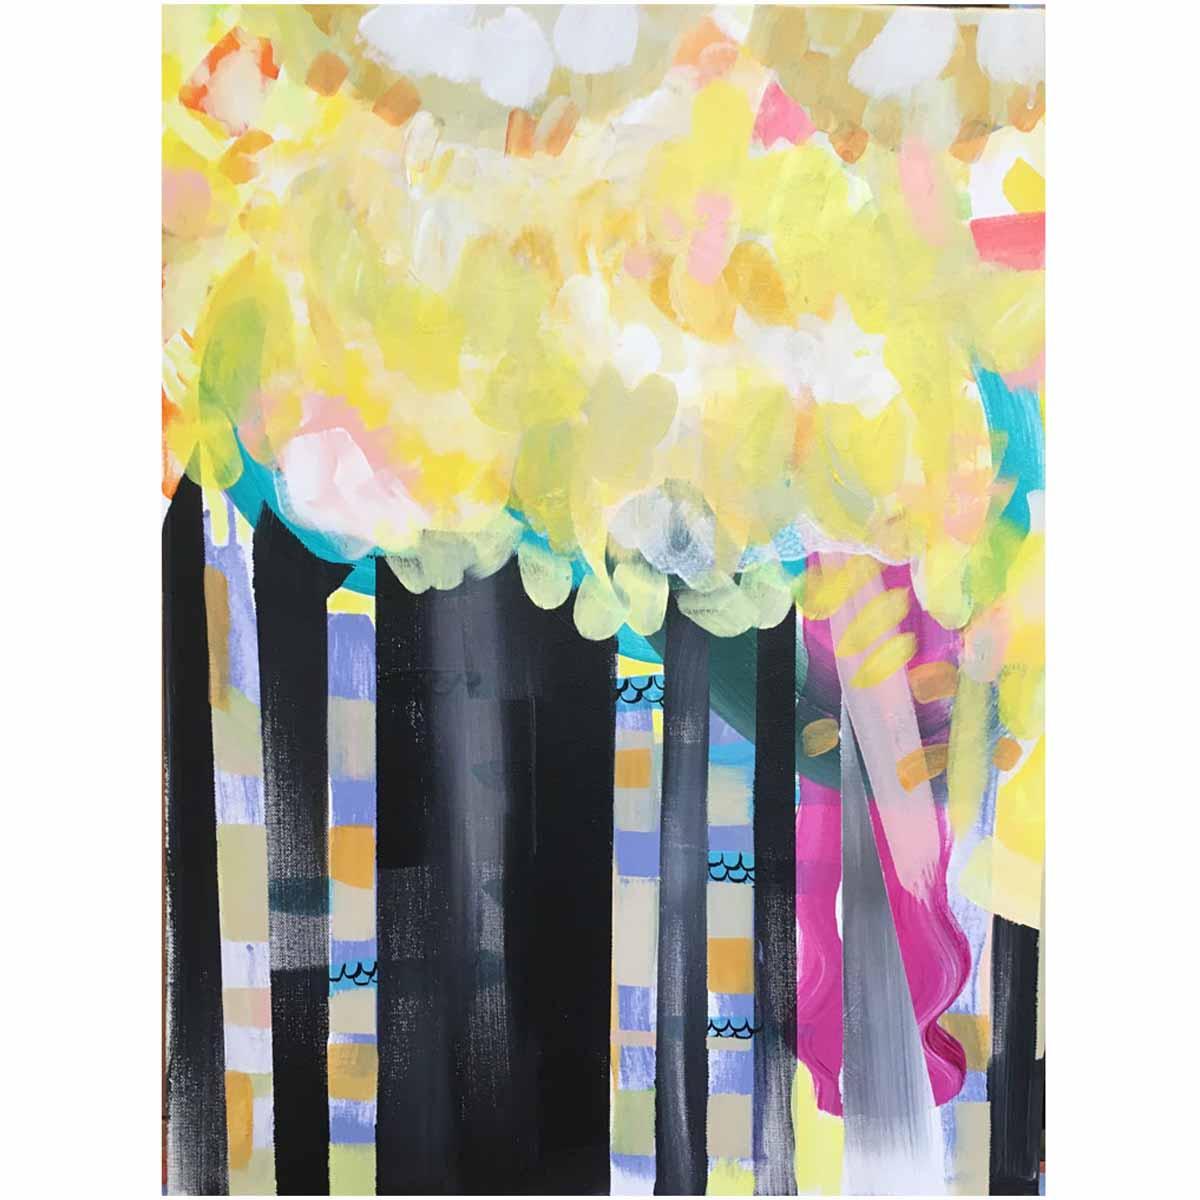 "A New Path Always Shines, 18x24"", Acrylic on Canvas"